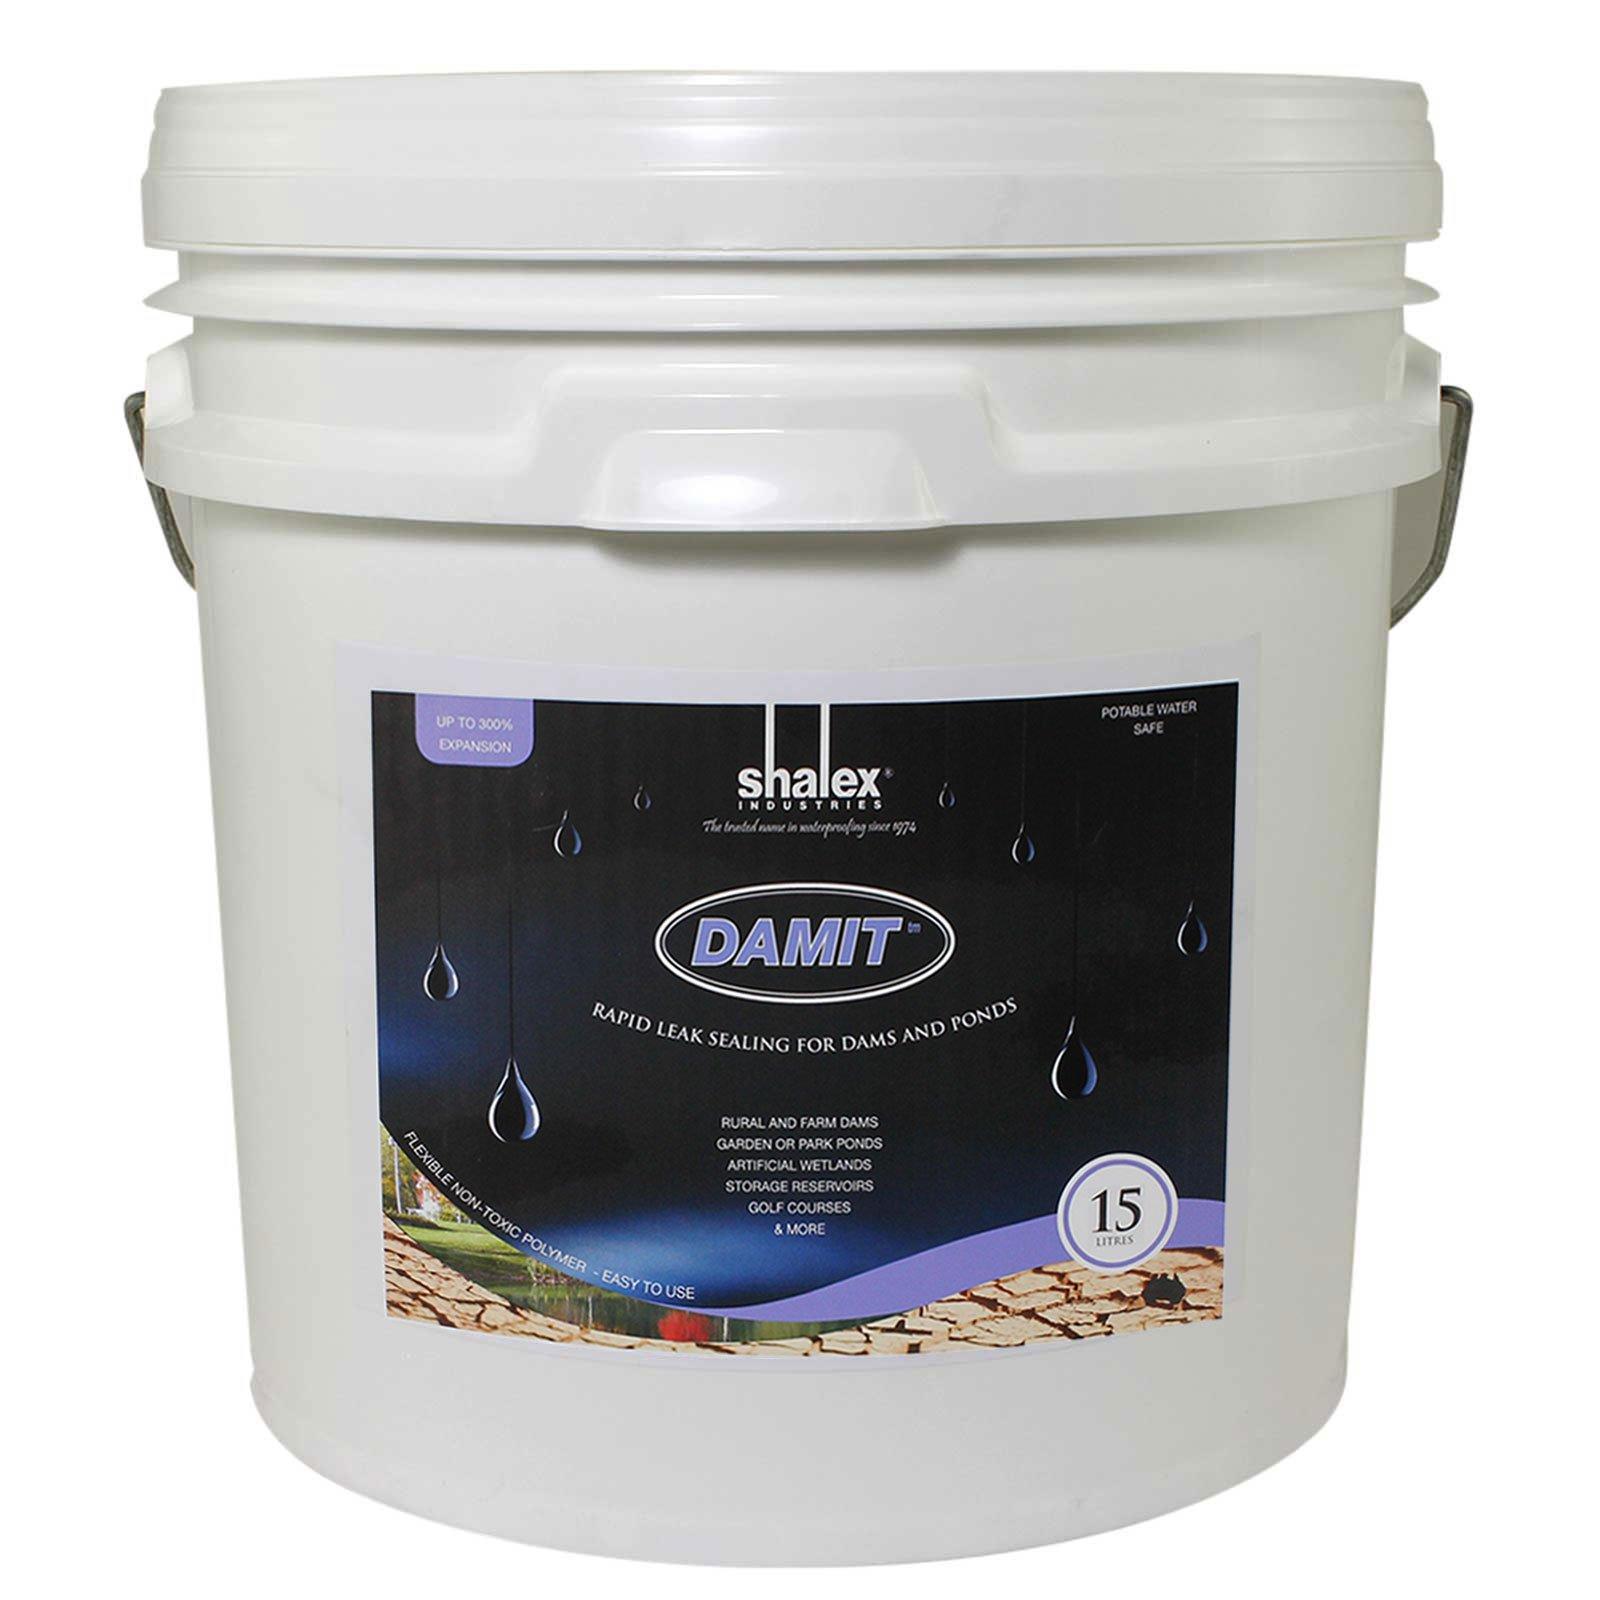 DamIt - Rapid Leak Sealer for Dams and Ponds 15L by Shalex